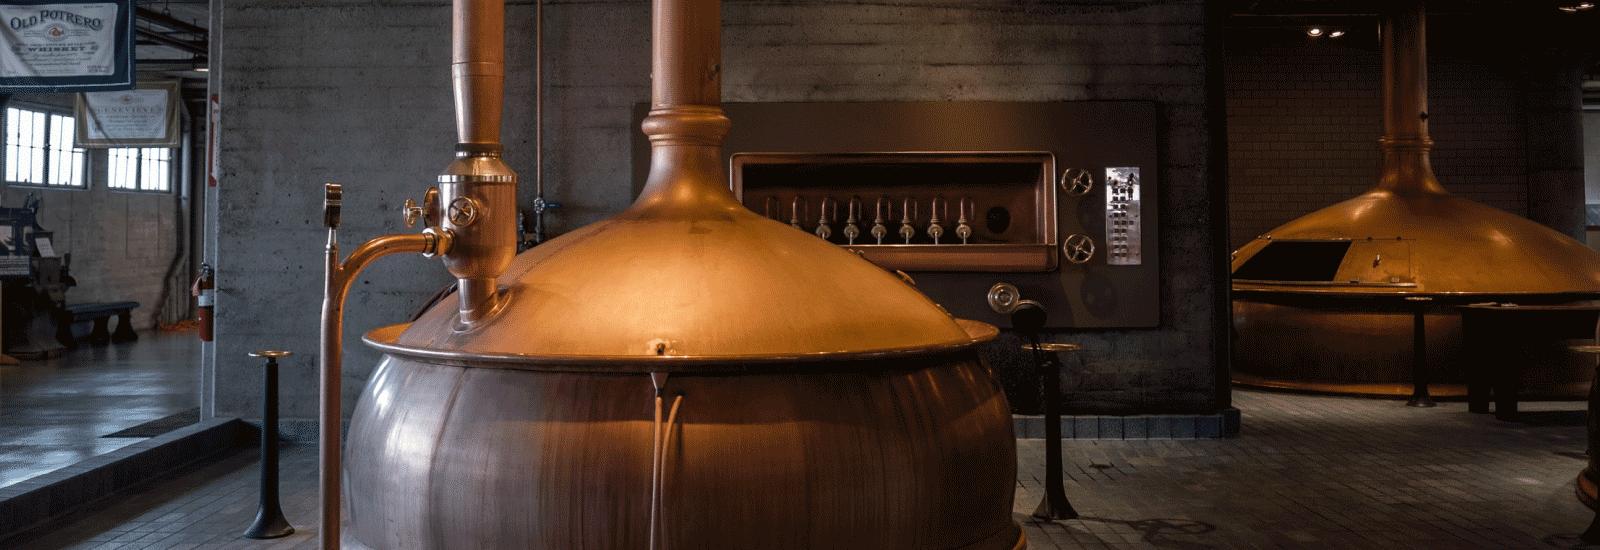 Hanscom AFb Breweries